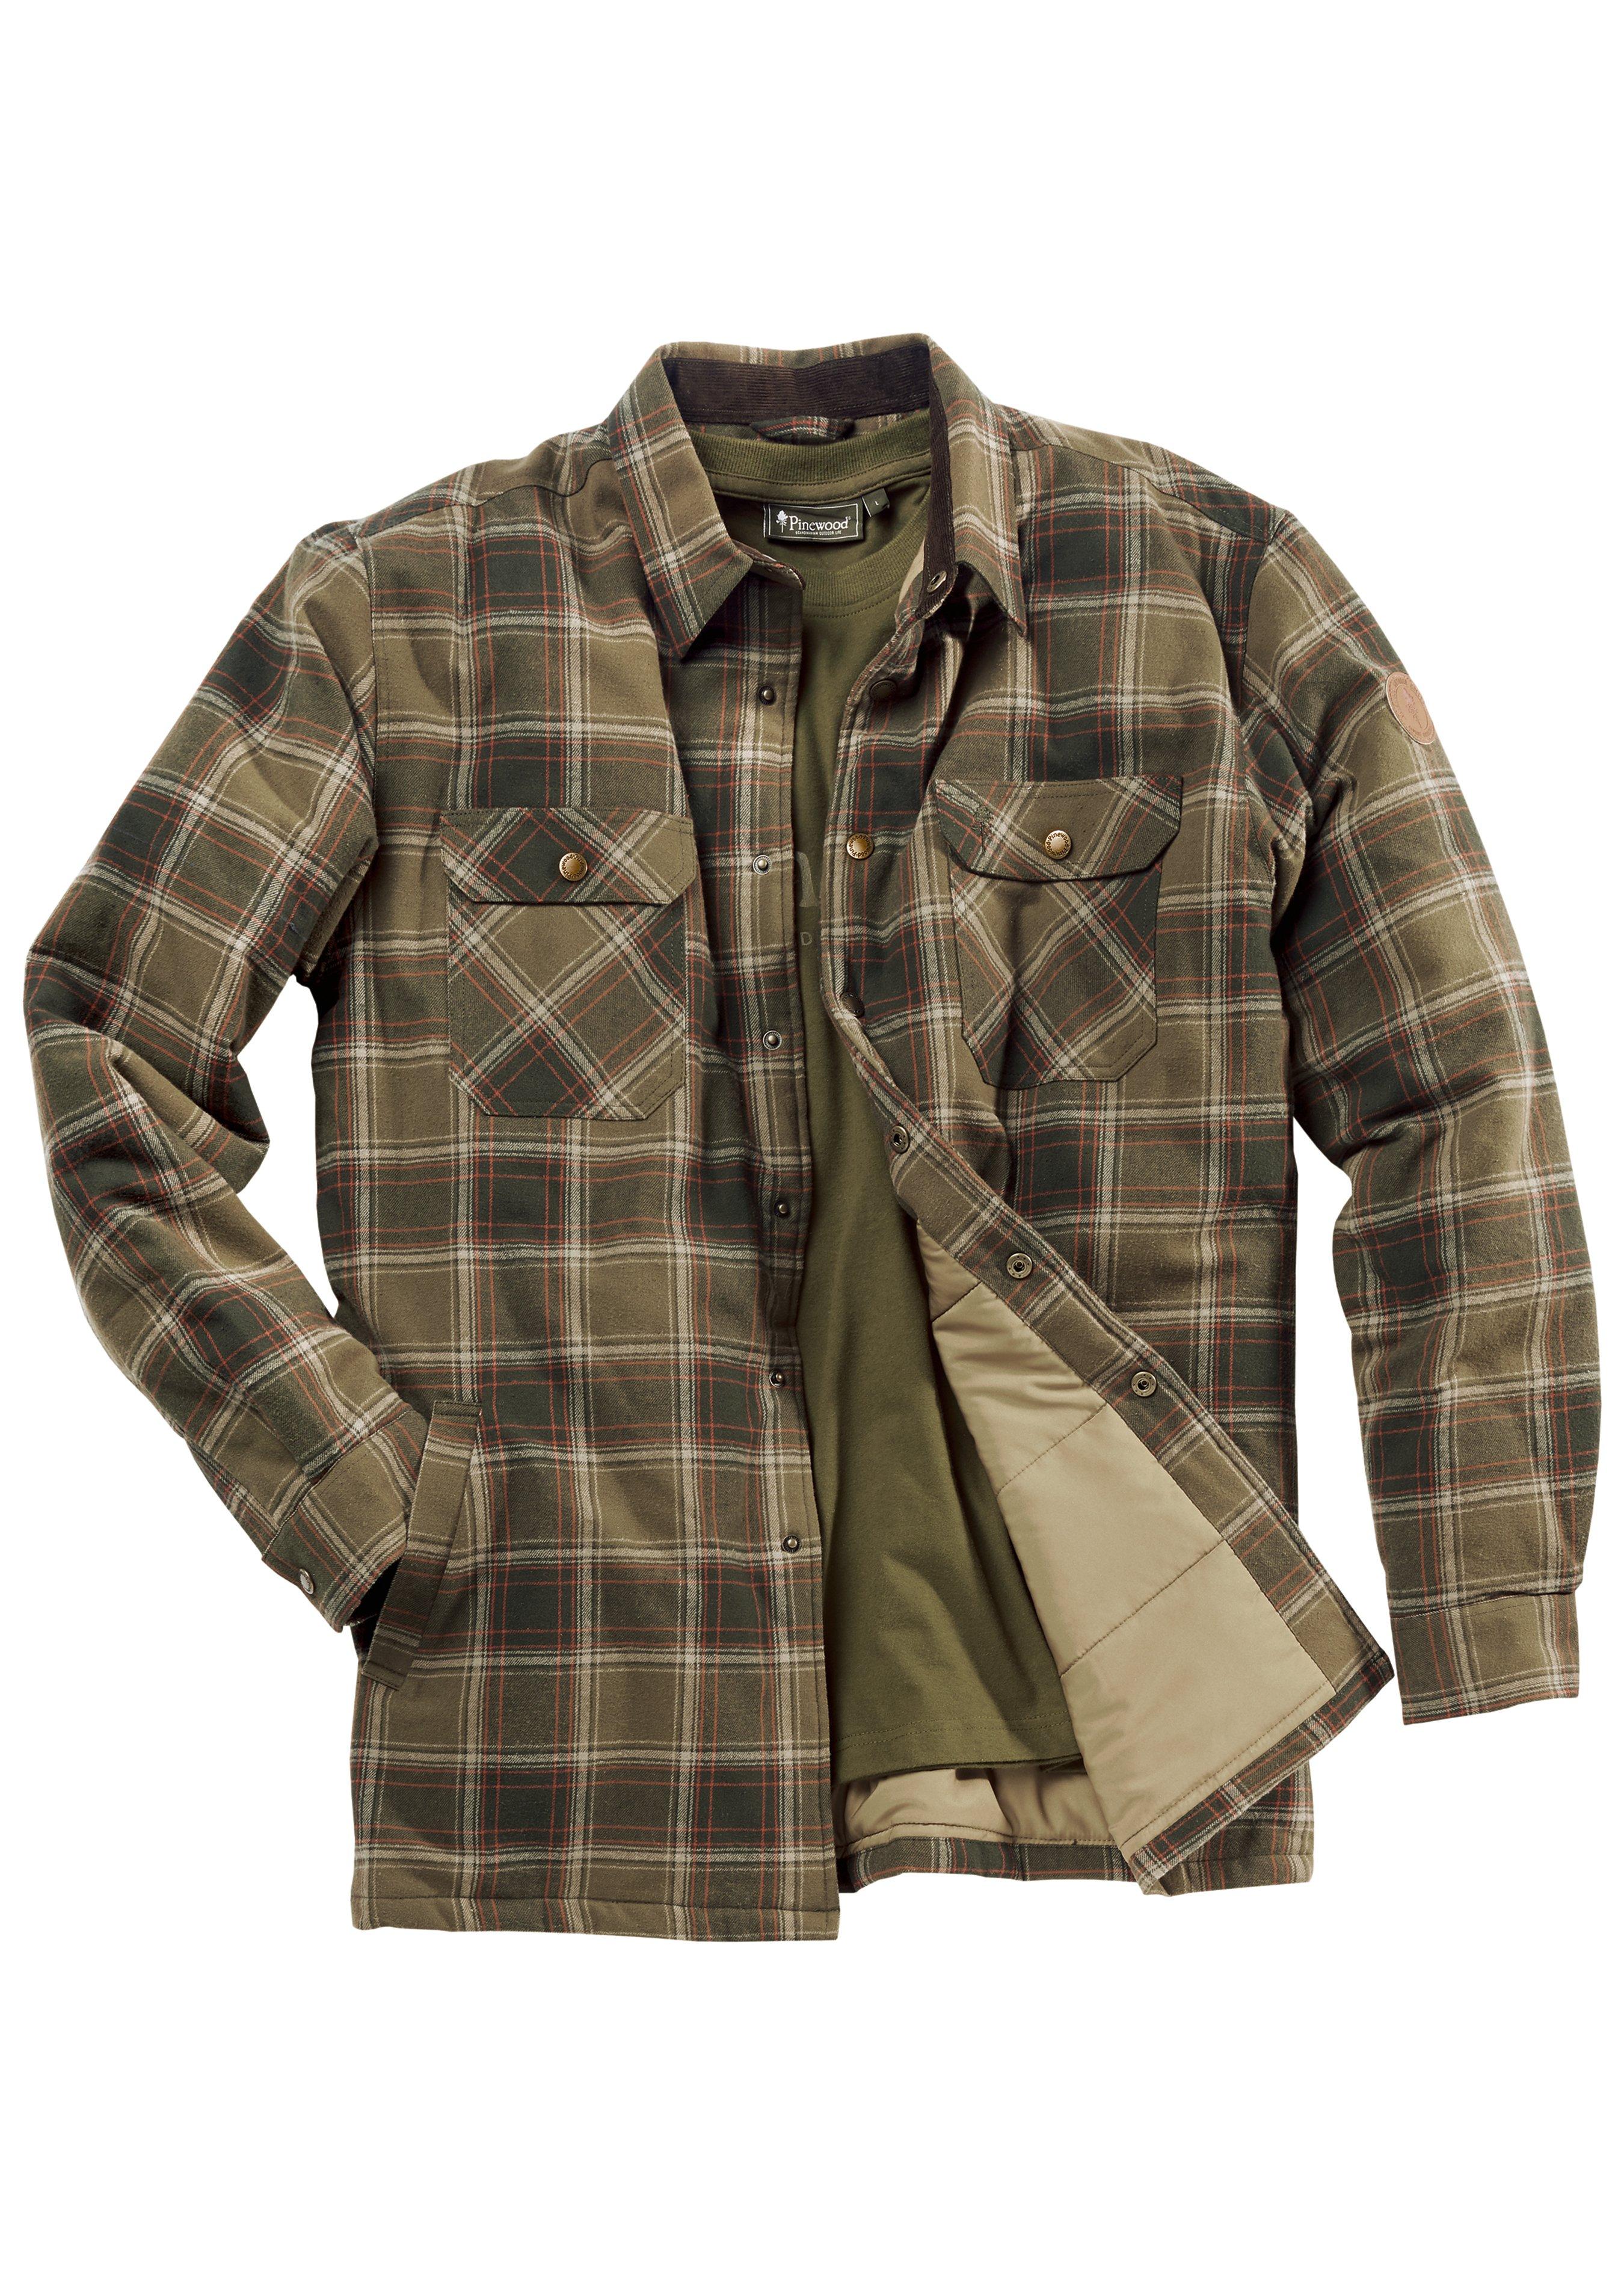 Veste-chemise en flanelle Finnveden (5008) 284824XL 2